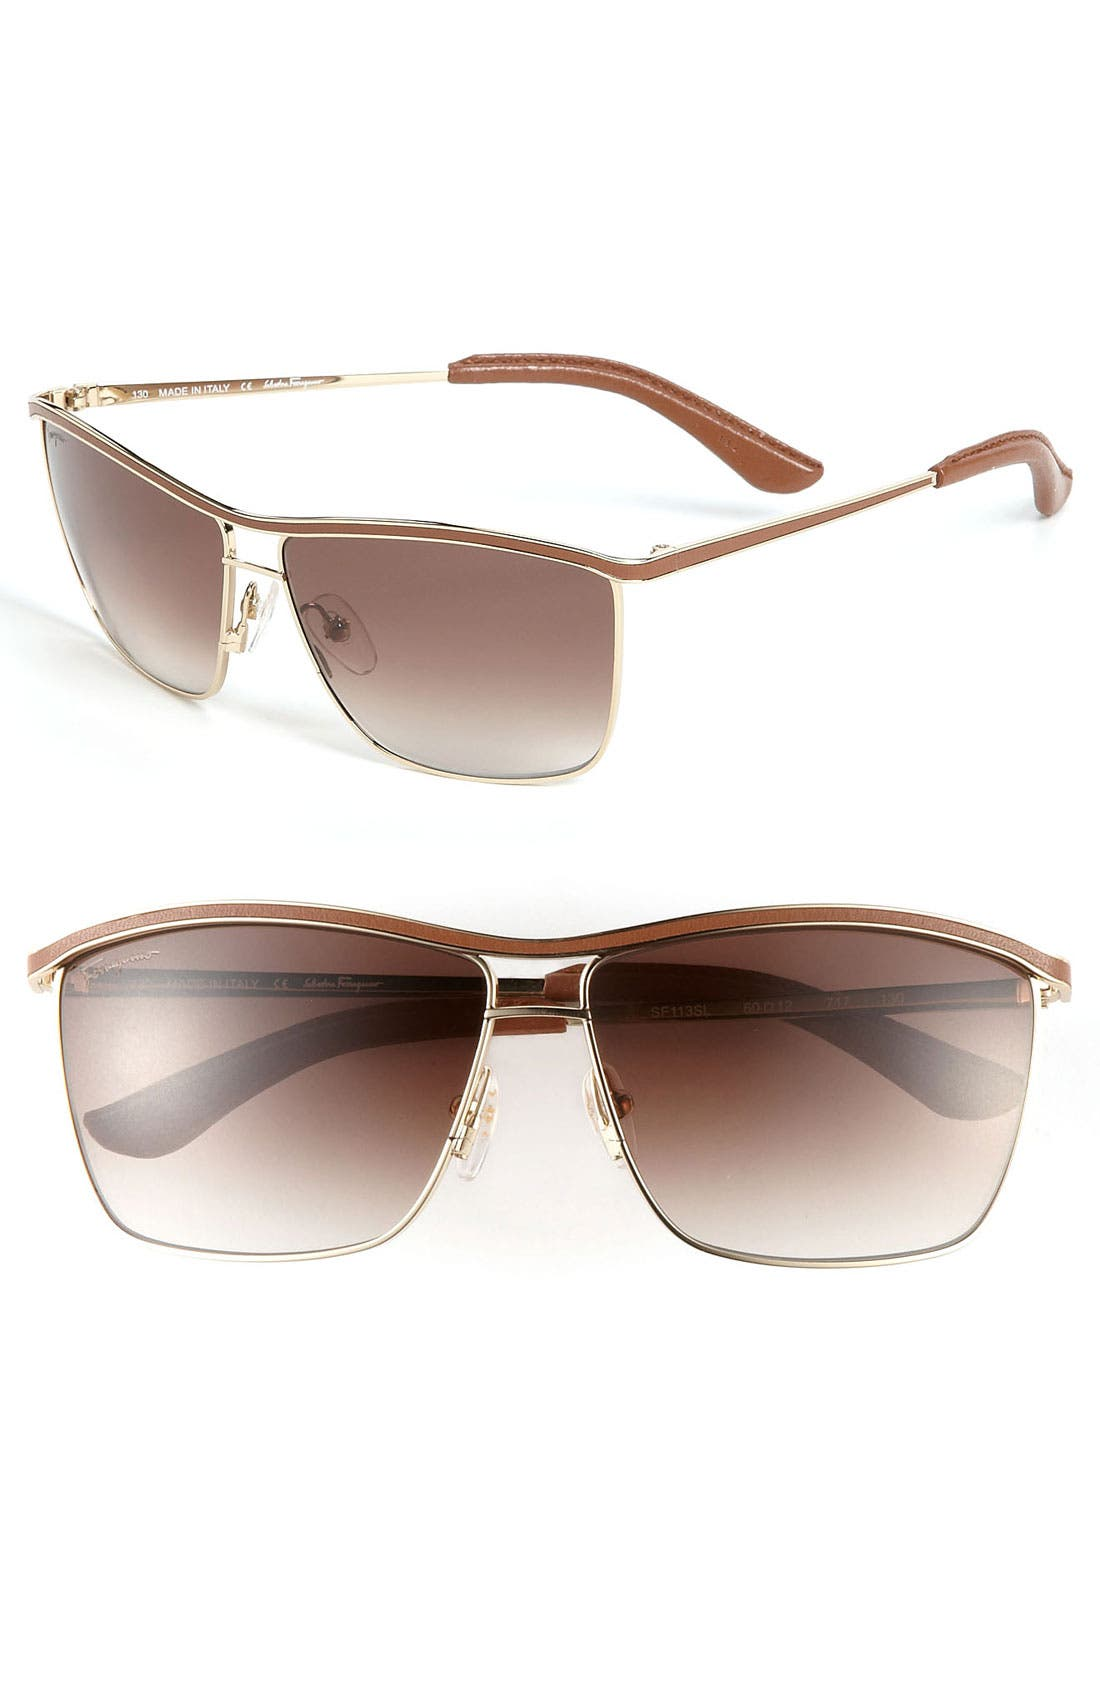 Alternate Image 1 Selected - Salvatore Ferragamo Navigator Sunglasses